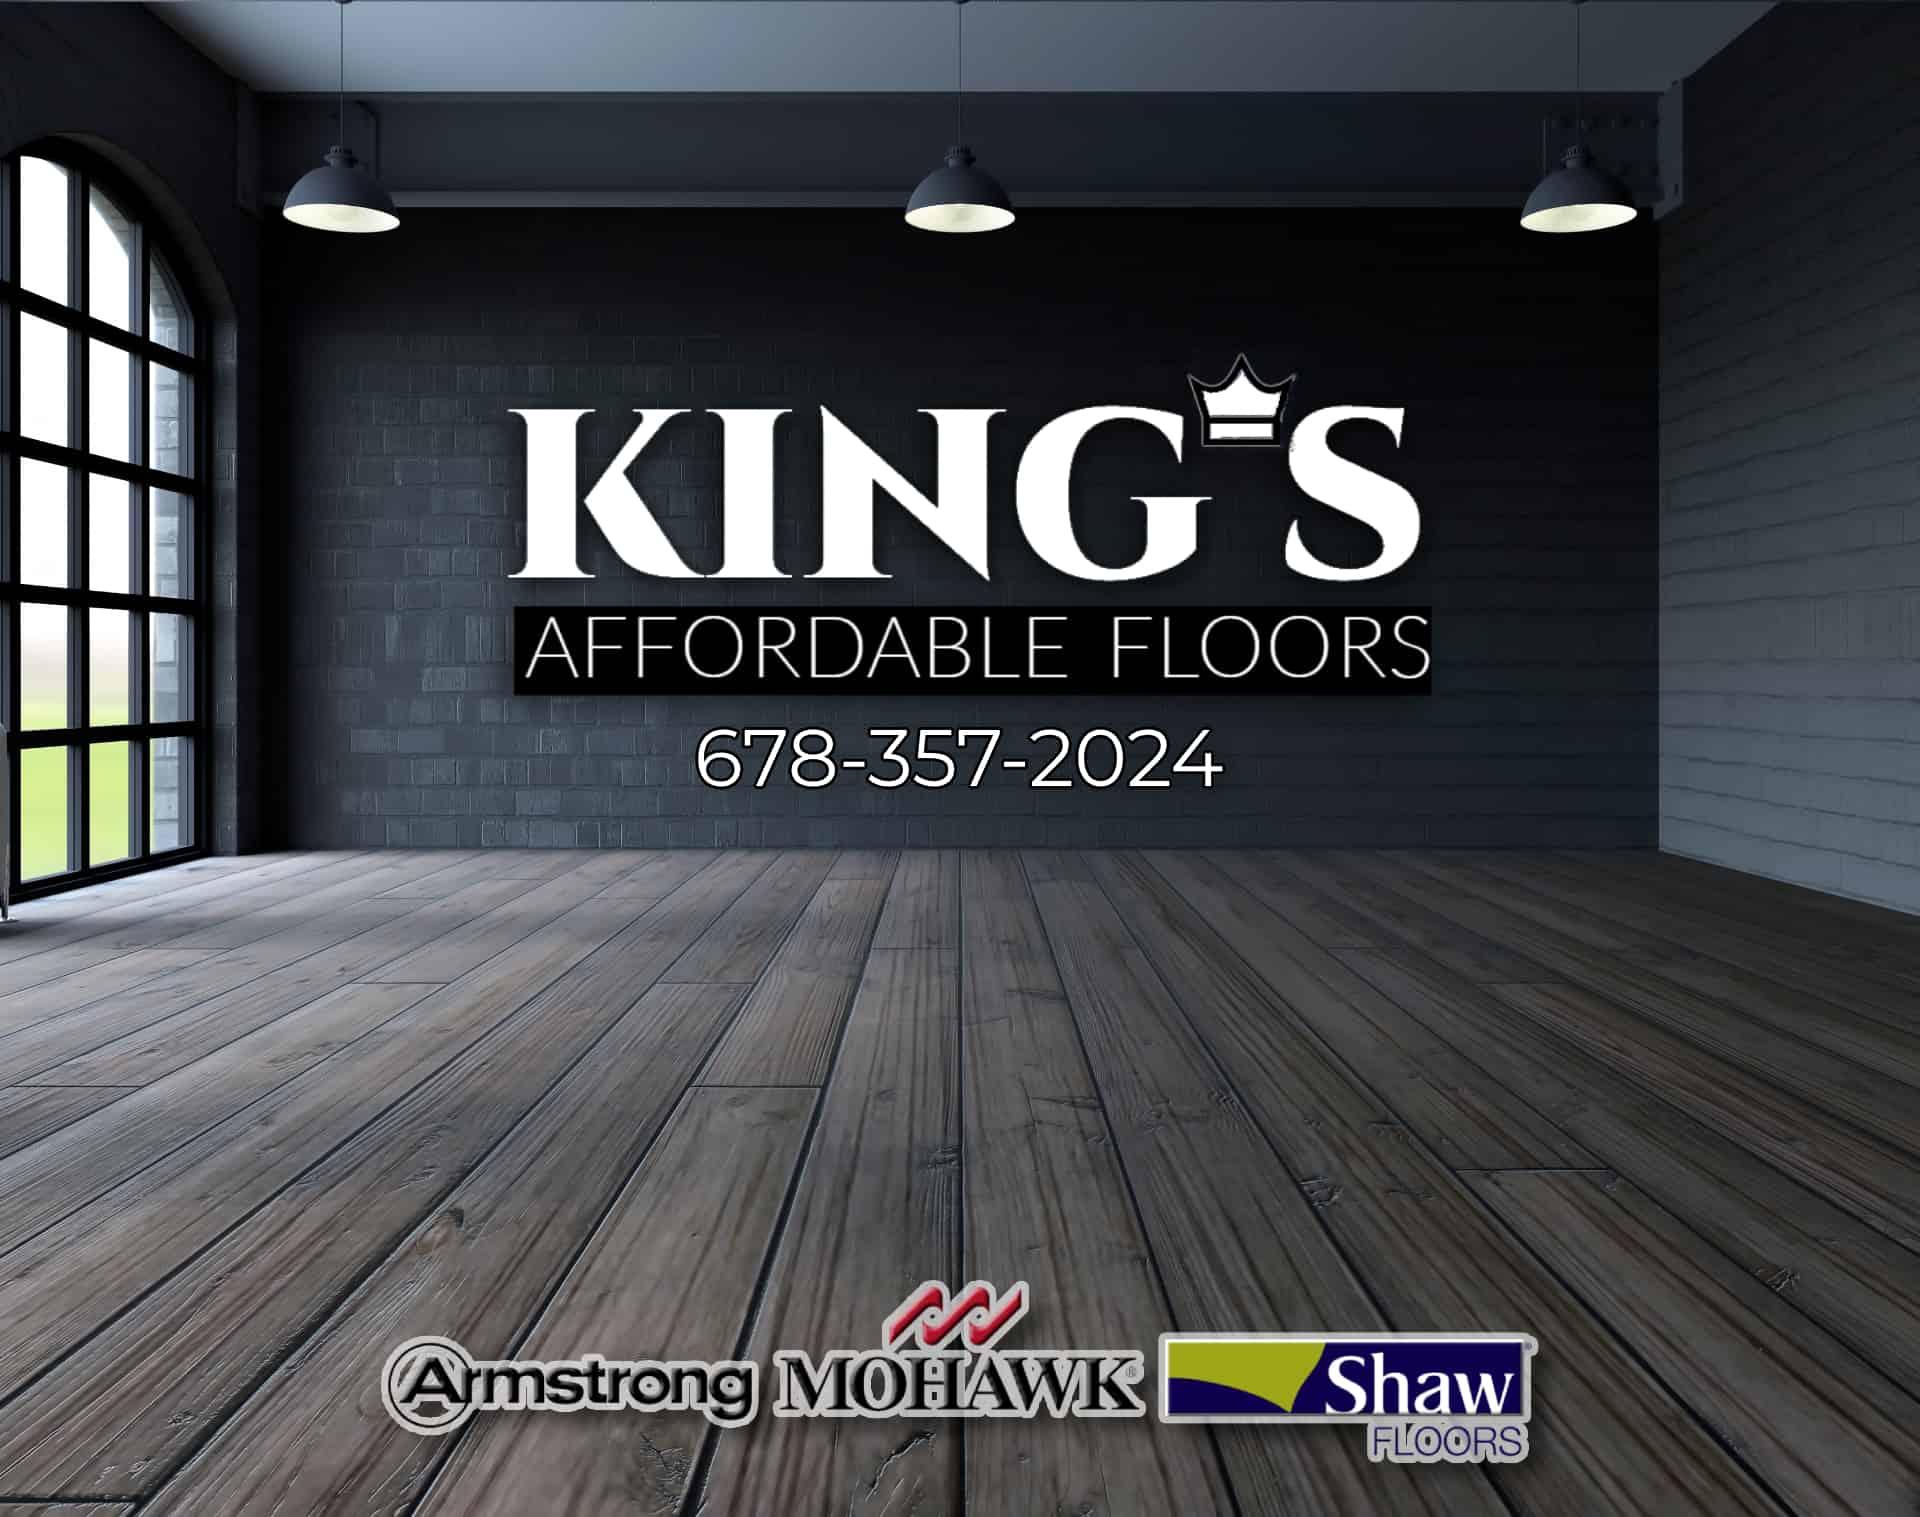 Kings Affordable Floors | Hardwood